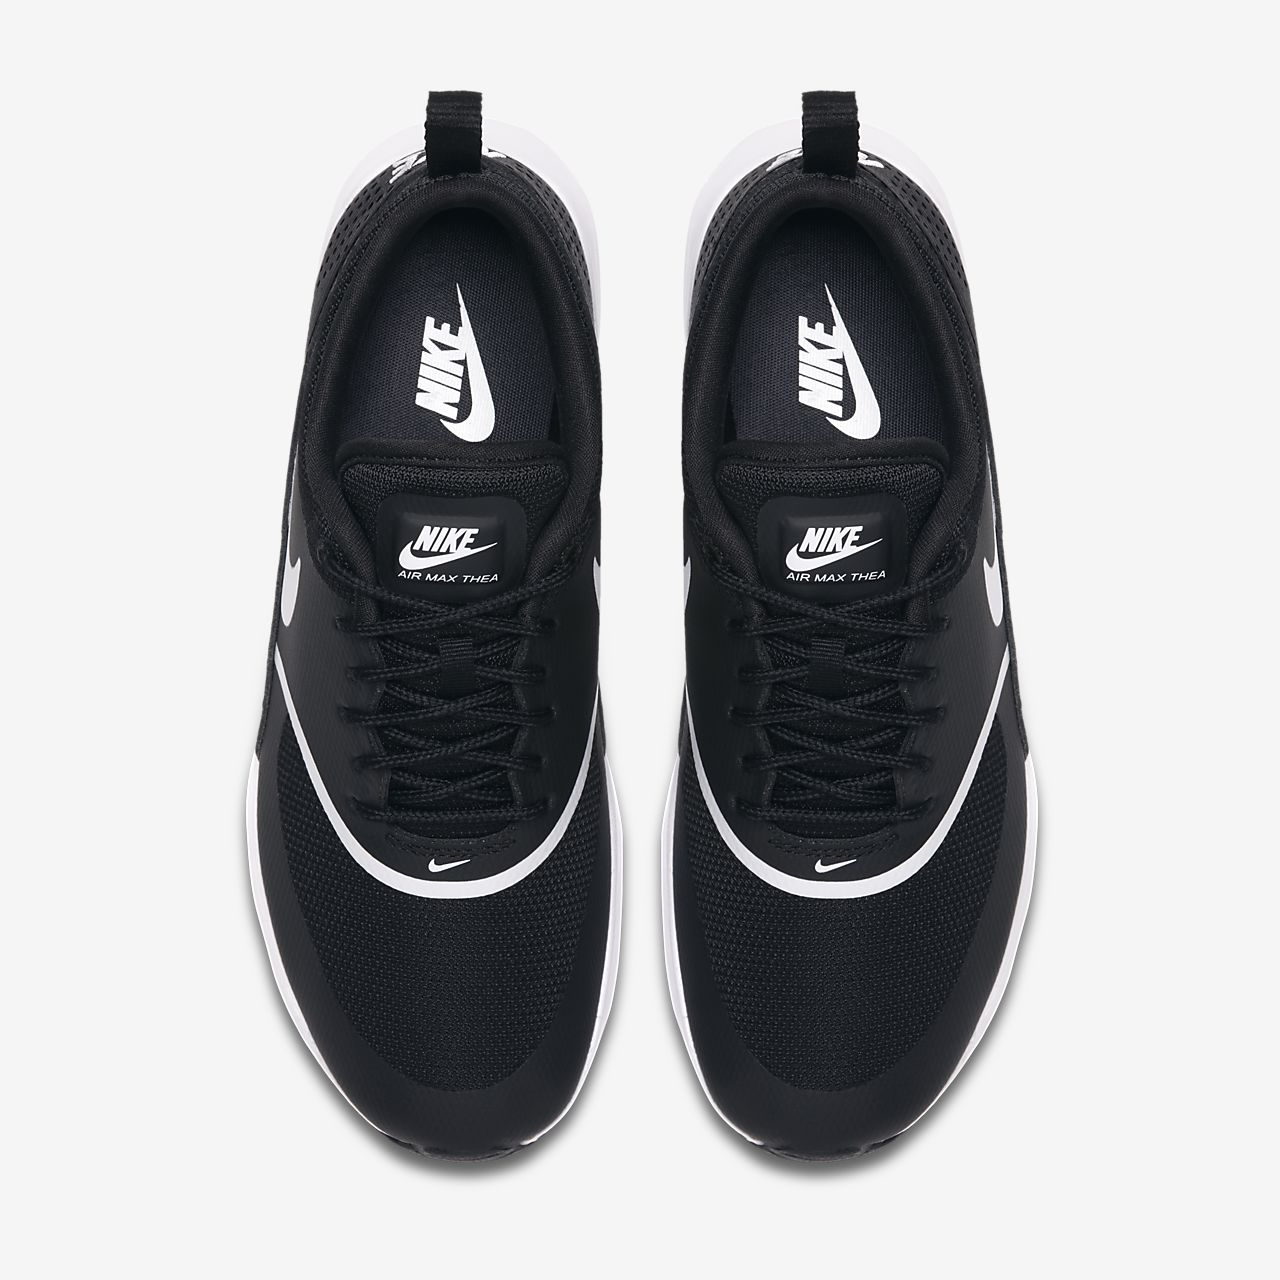 the latest 48177 67938 ... Scarpa Nike Air Max Thea - Donna